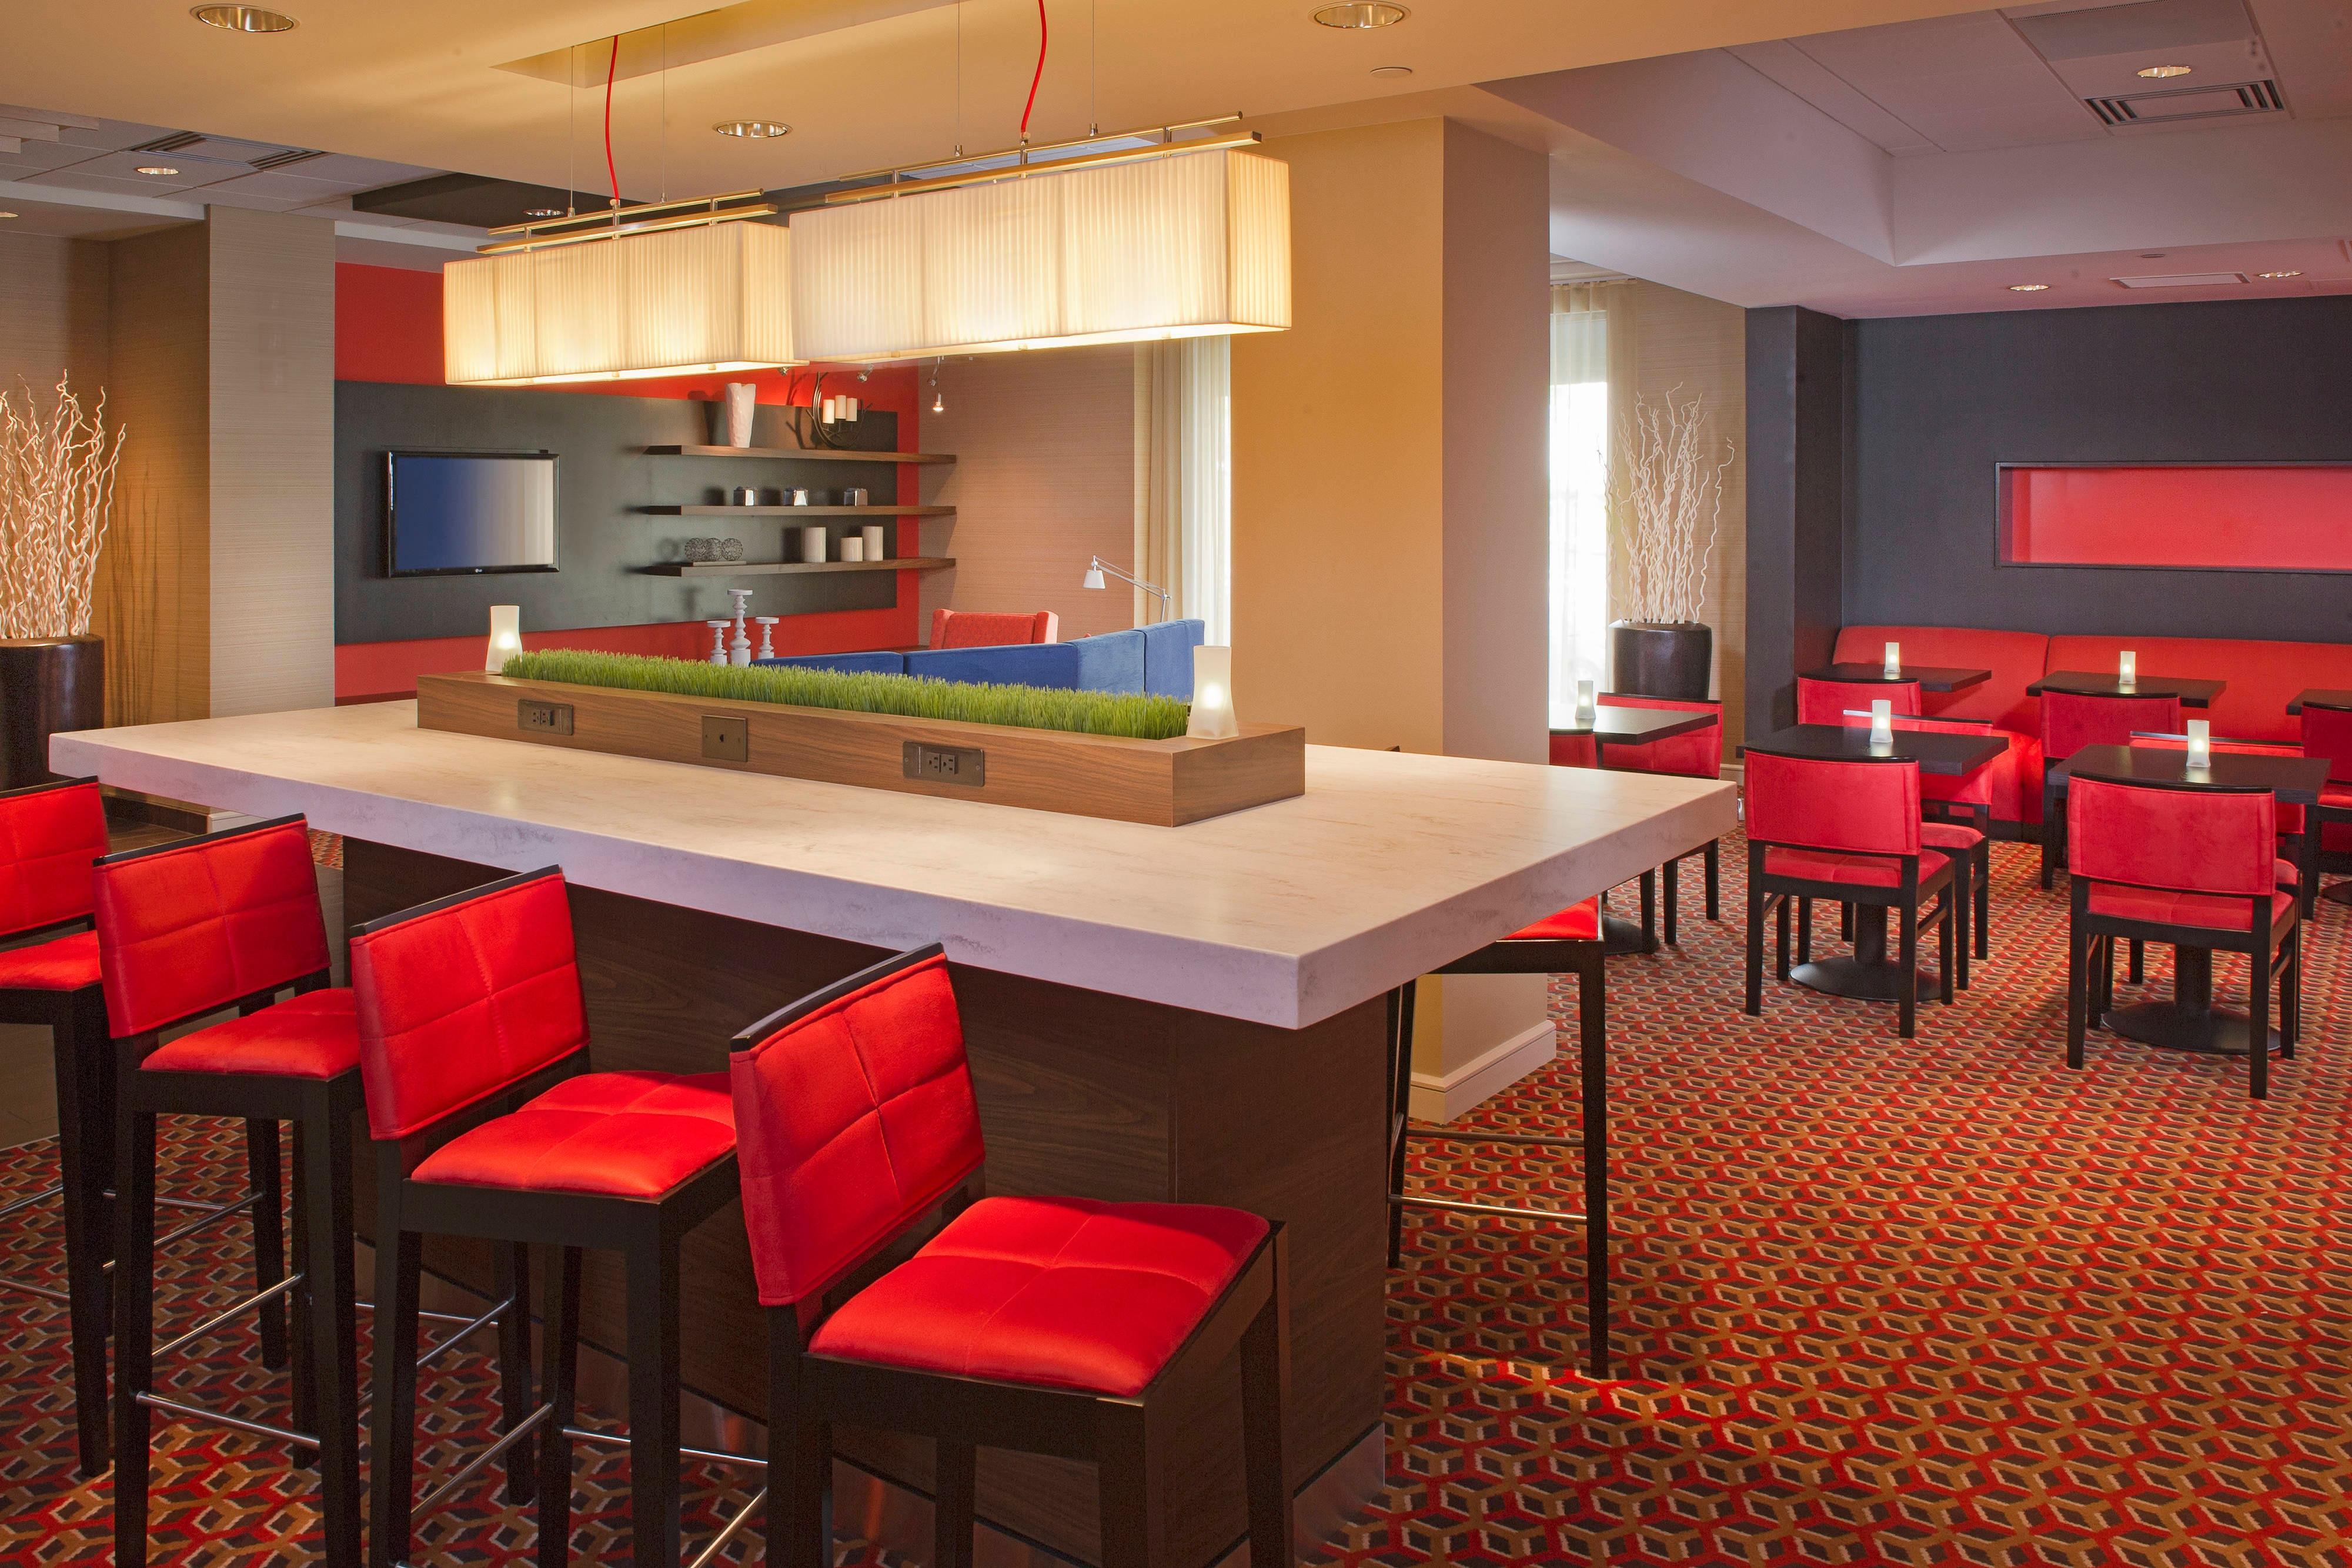 dupont circle hotel dining